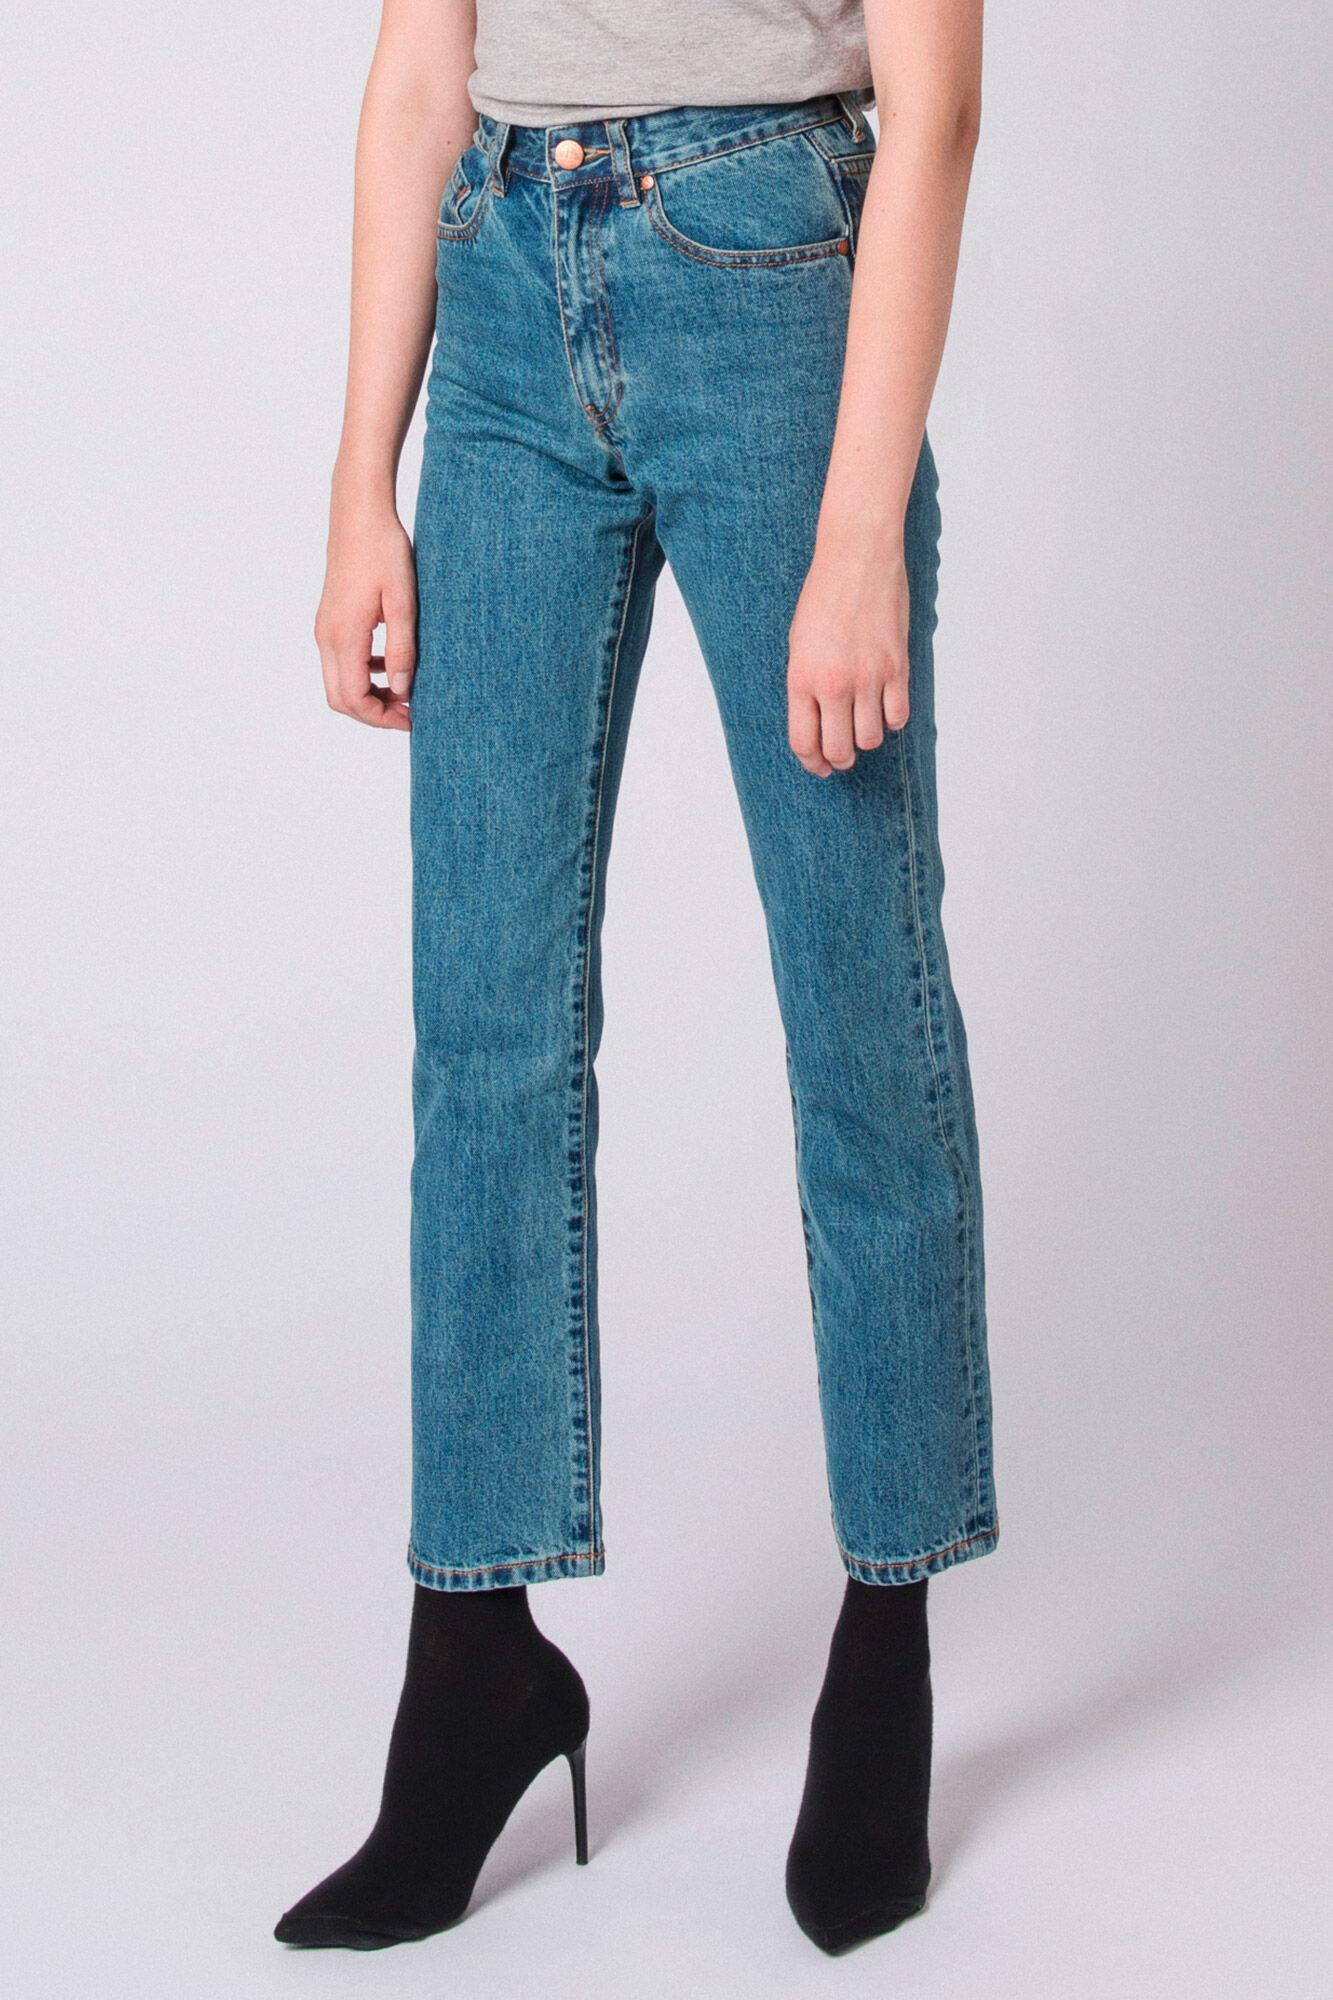 Boyfriend Jeans F-90058-12, HEAVY STONE WASH